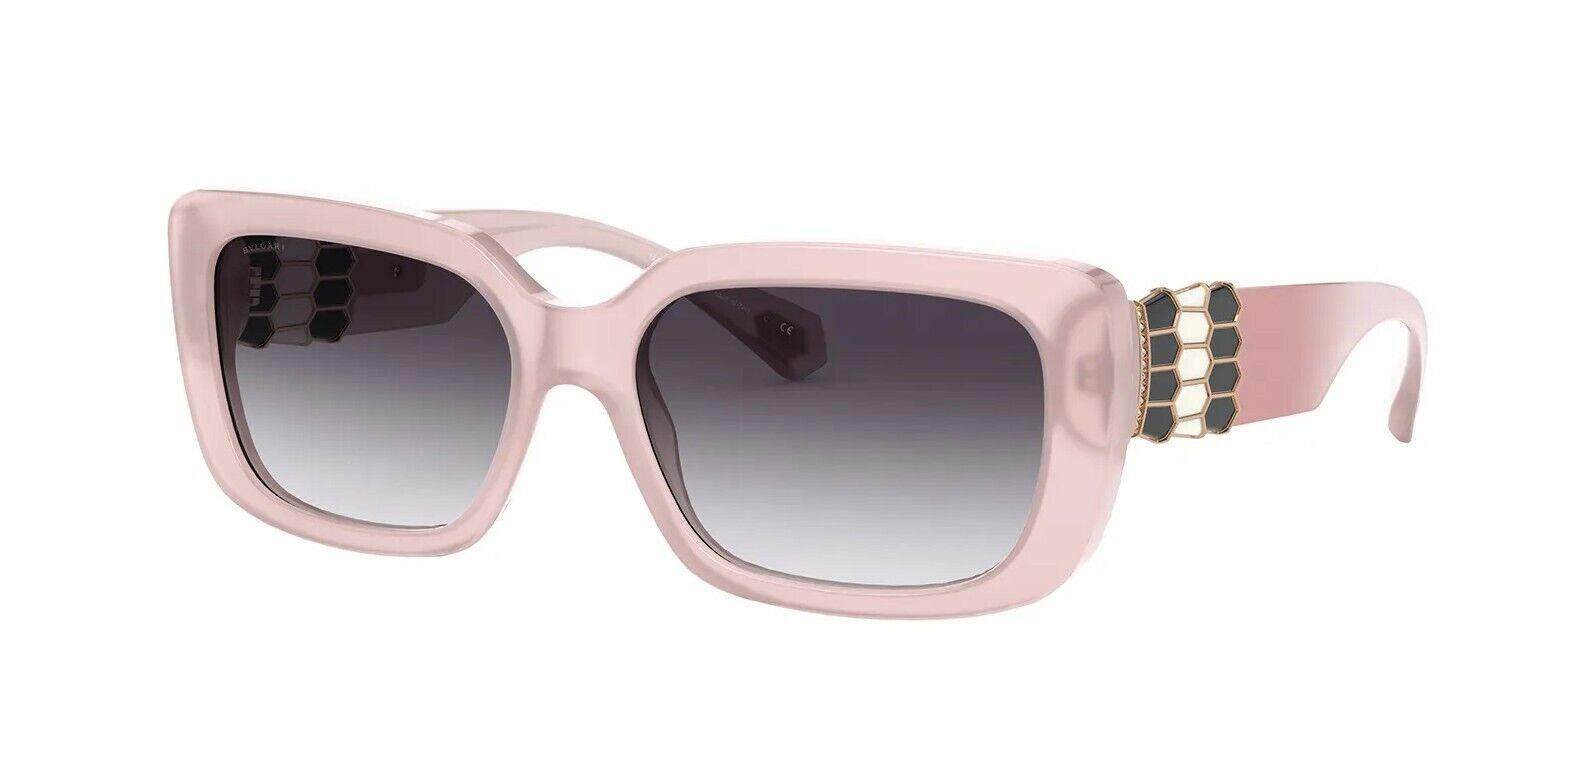 Bvlgari SERPENTI BV 8223B Pink/Grey Shaded (5479/8G) Sunglasses